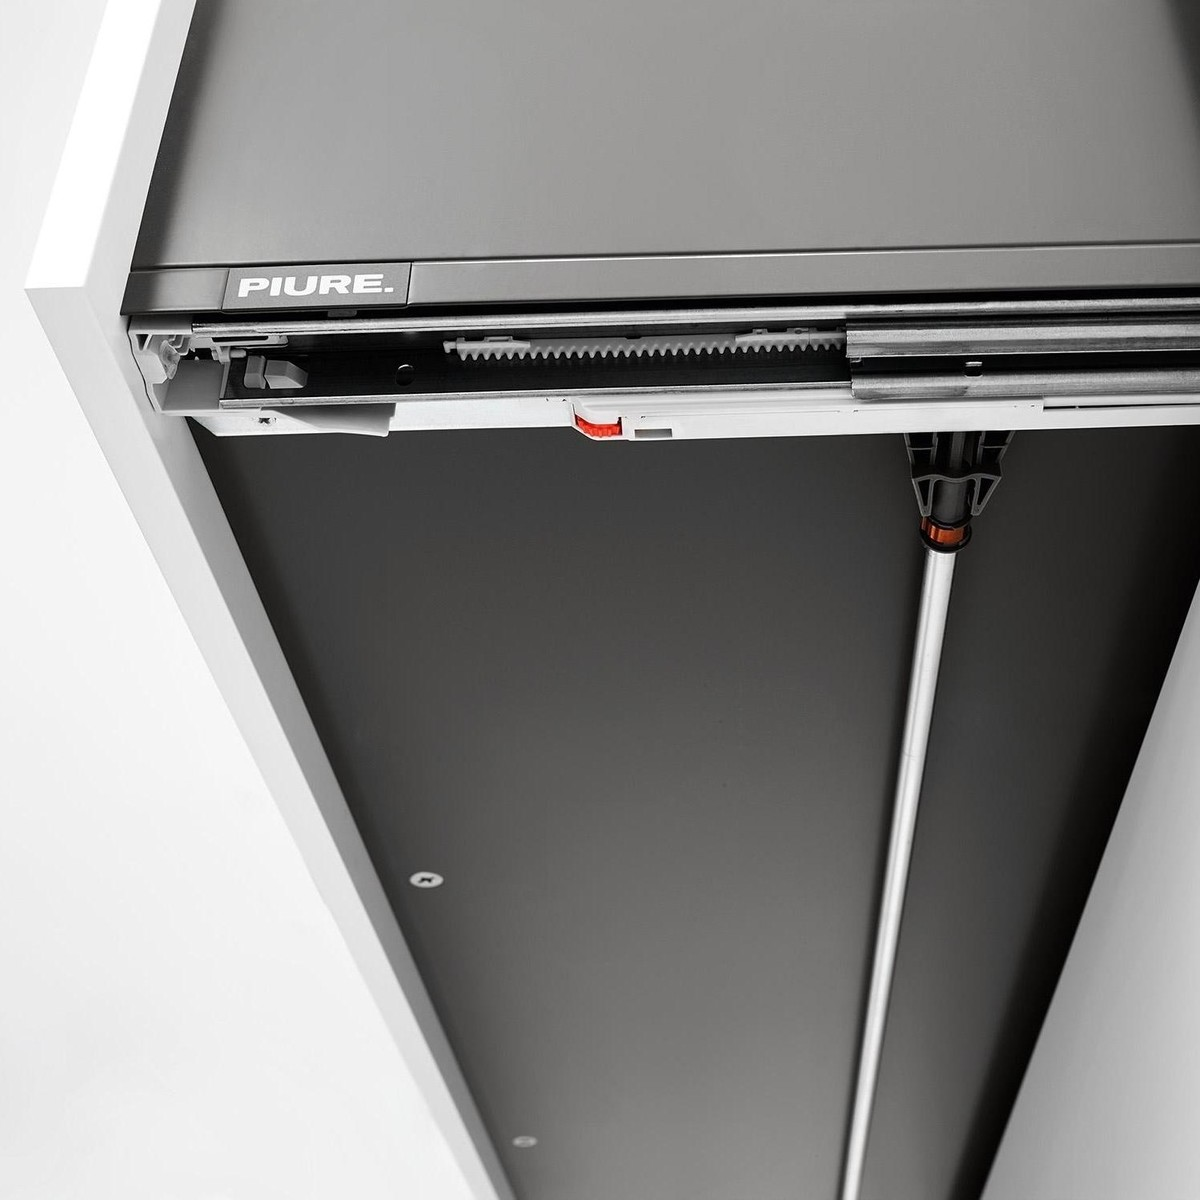 nex pur box sideboard piure. Black Bedroom Furniture Sets. Home Design Ideas